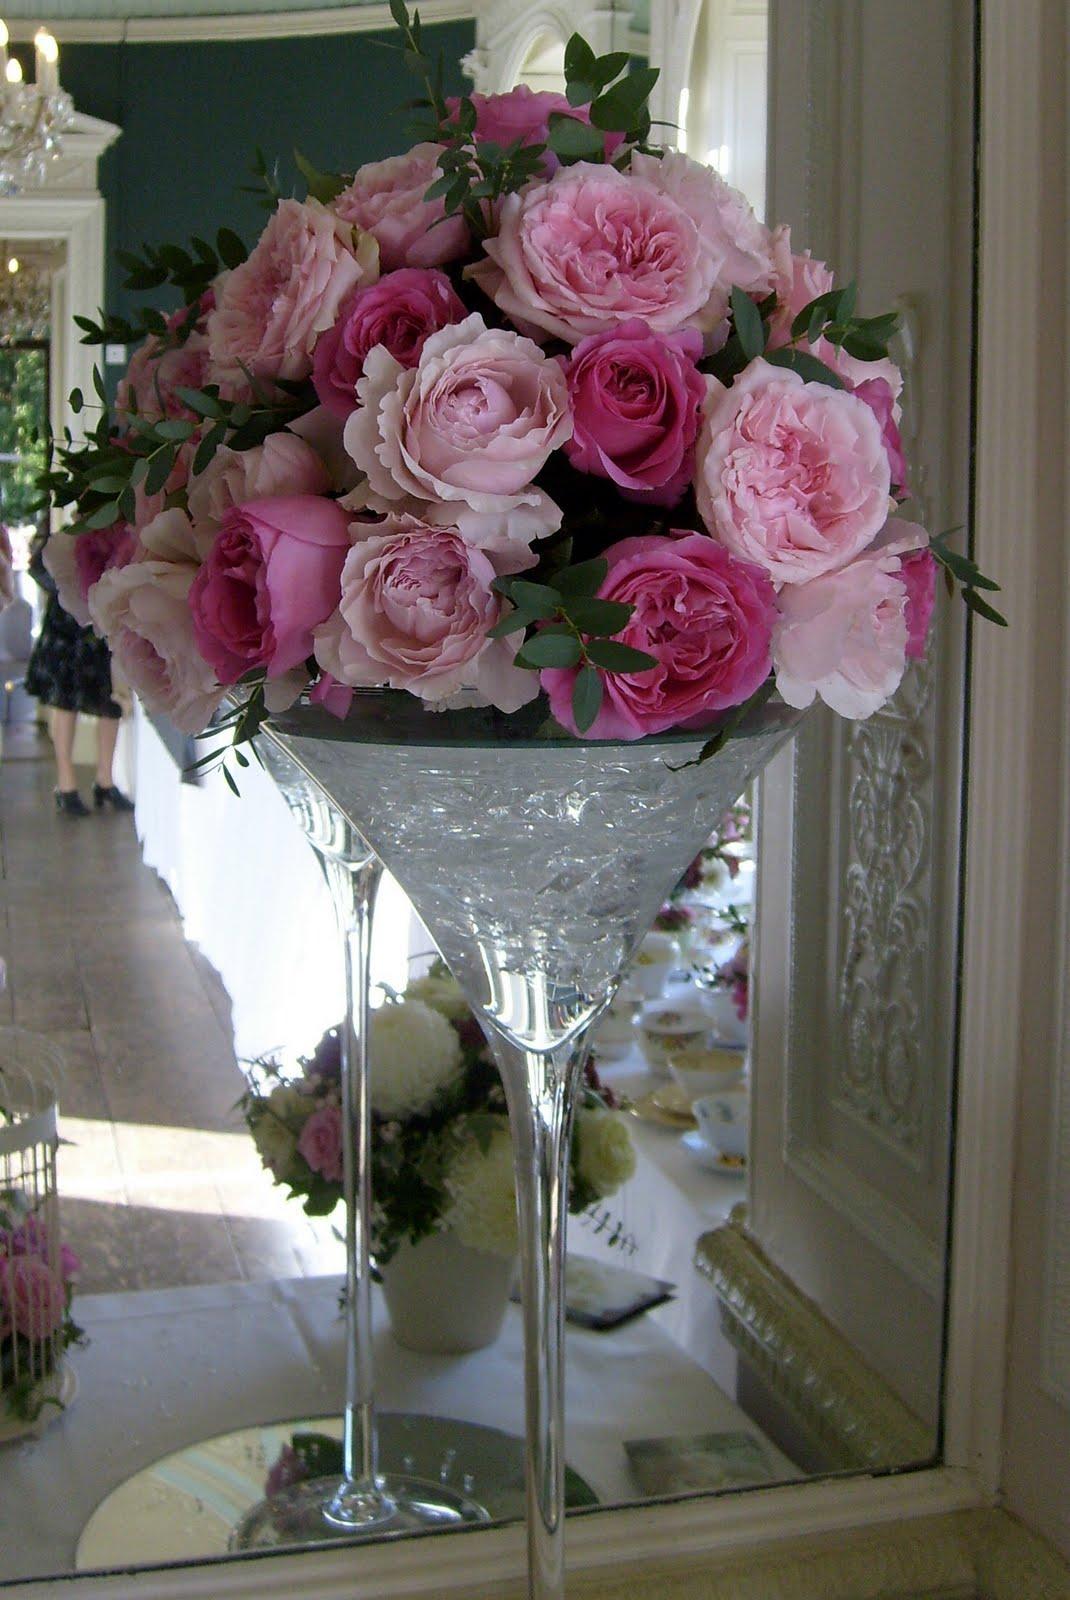 Bows blooms october 2010 martini vase arrangement of david austin miranda rosalind and emily country garden roses reviewsmspy